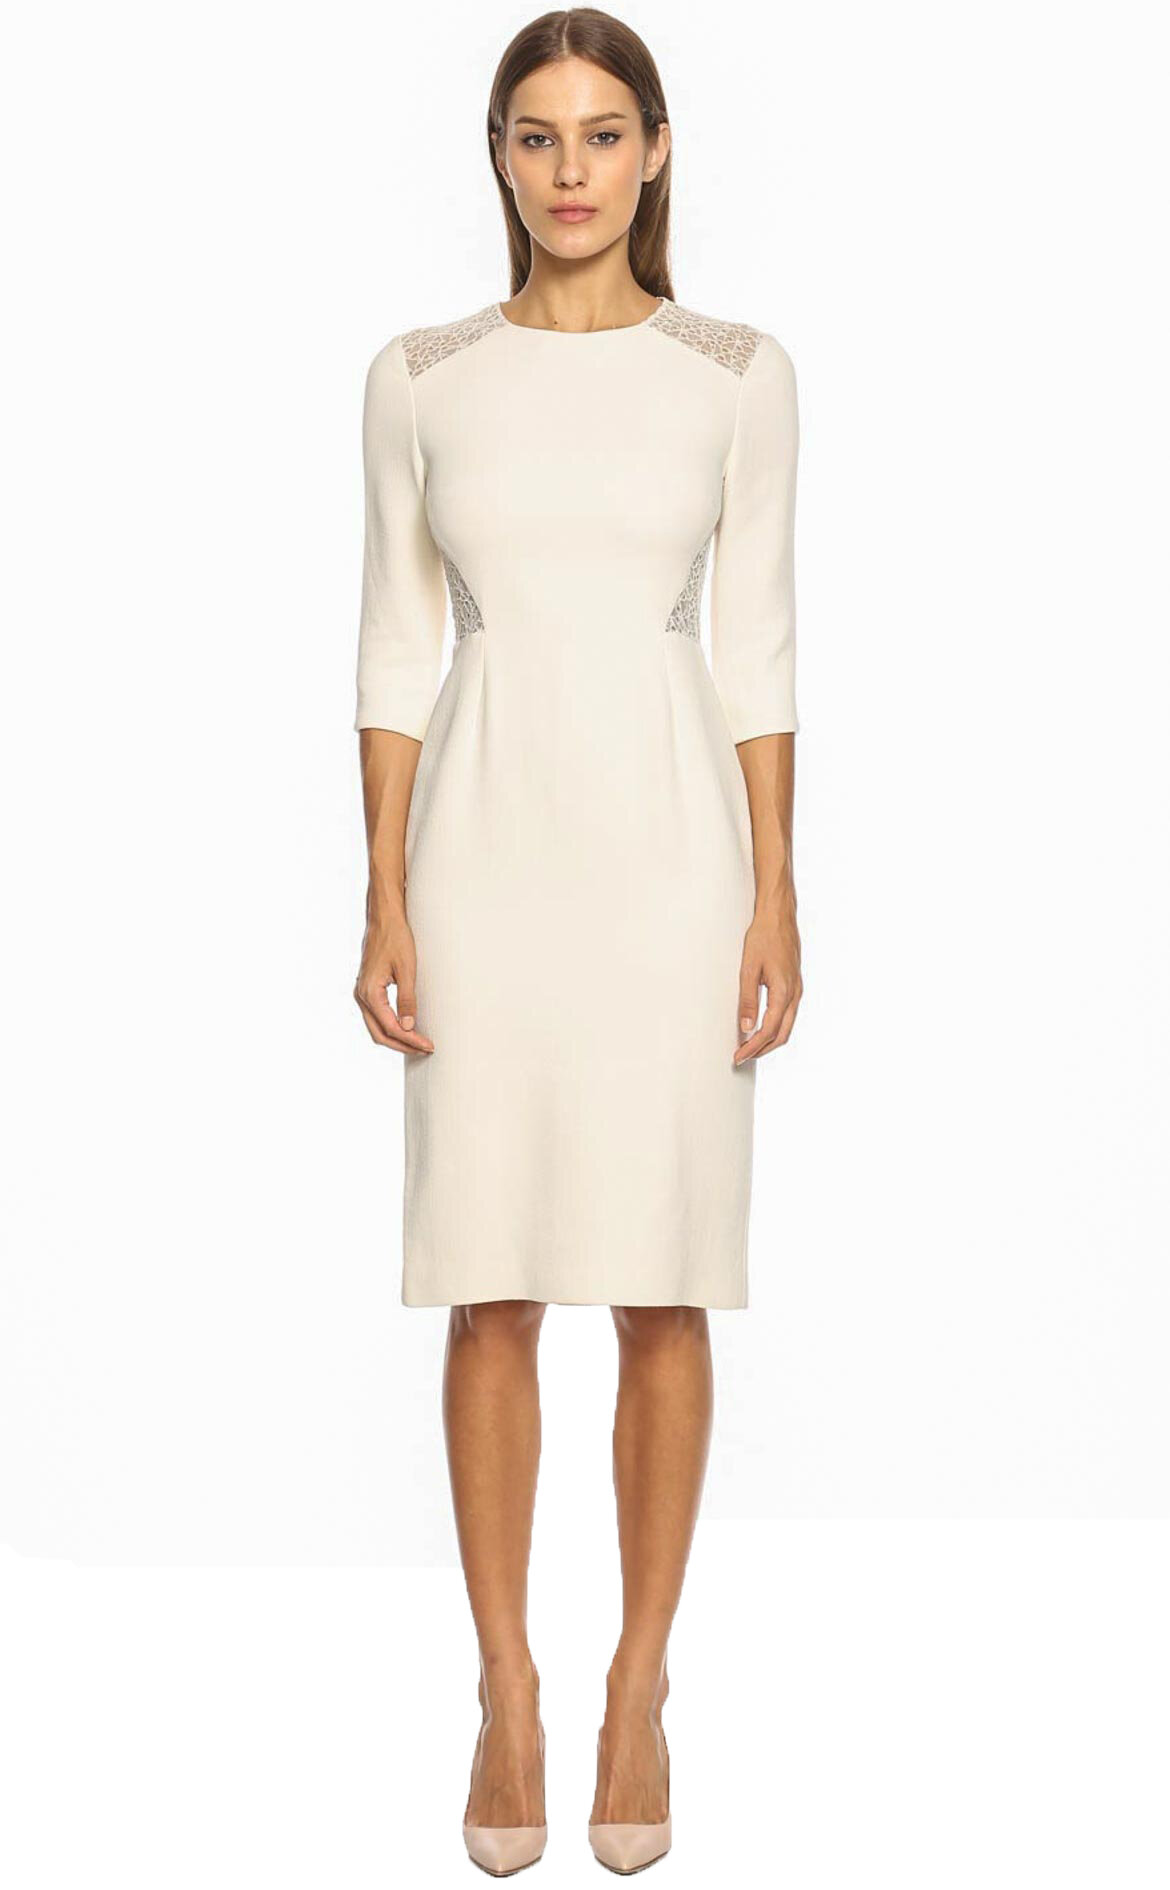 Jason Wu Kadın Elbise JWUS1613020ABLK-BLACKMULTI - Brandroom